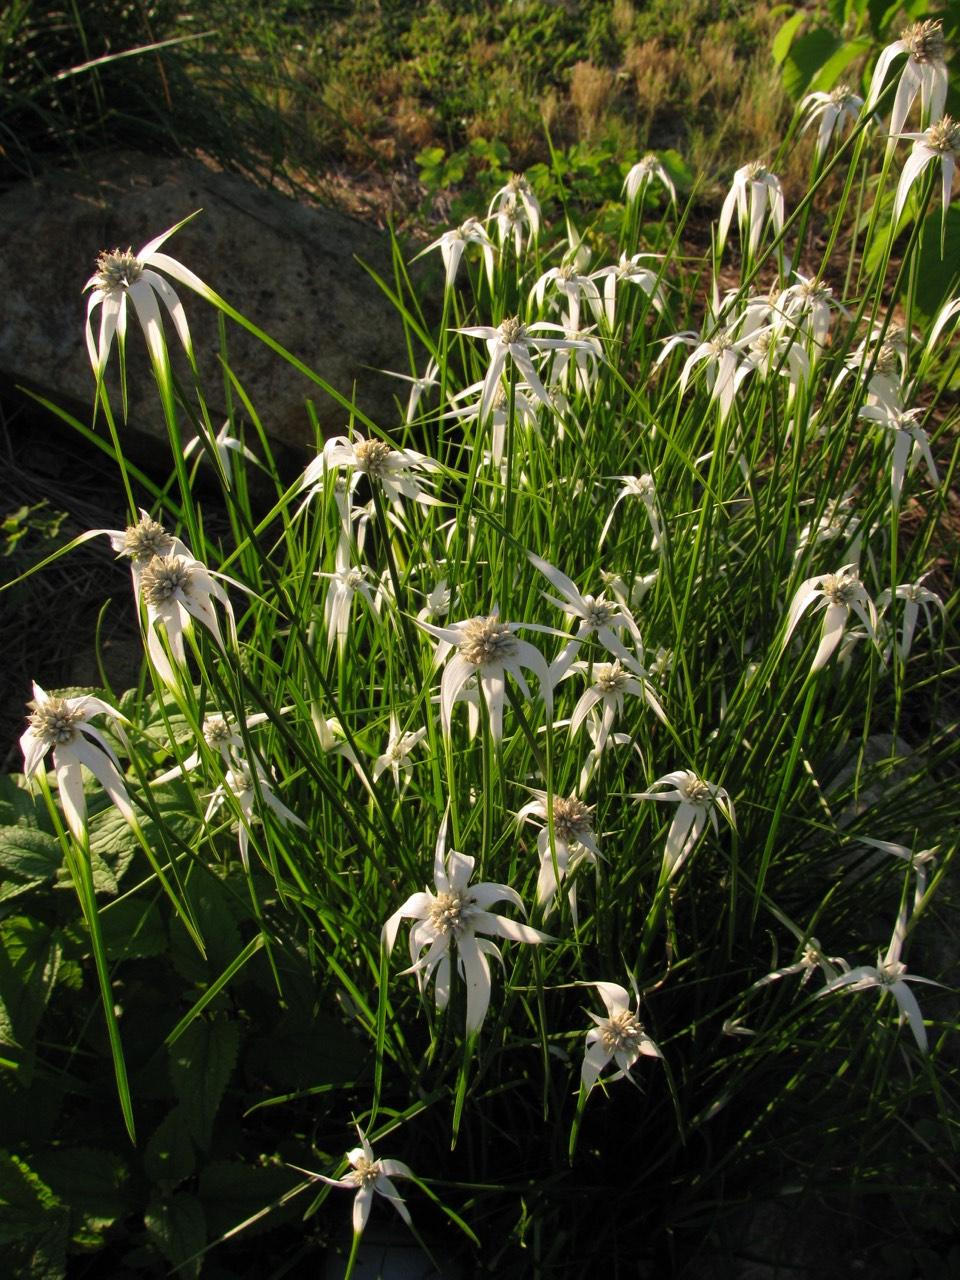 The Scientific Name is Rhynchospora colorata [= Dichromena colorata]. You will likely hear them called Narrowleaf White-topped Sedge, White-top Sedge, Star Rush, Star Sedge. This picture shows the Growing in a bog garden of Rhynchospora colorata [= Dichromena colorata]